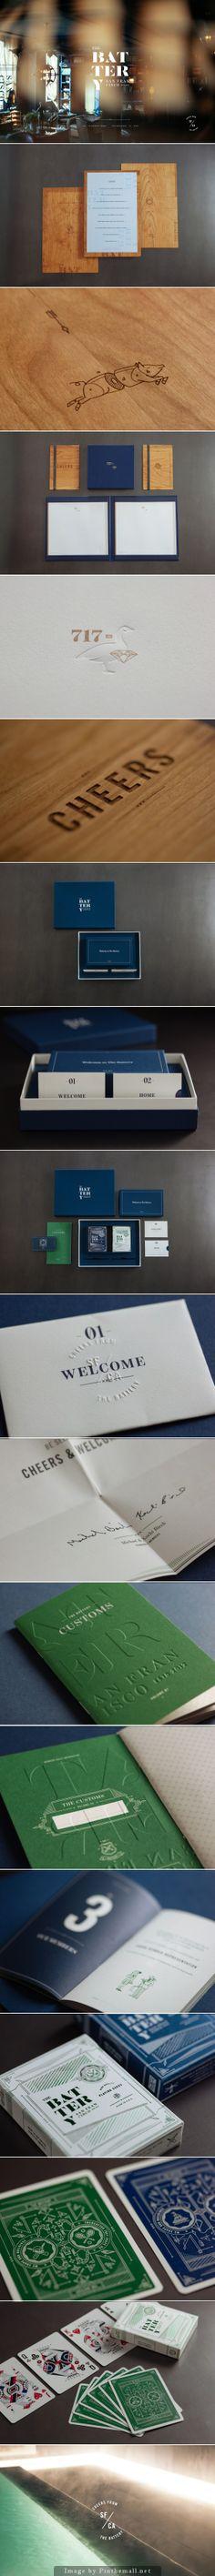 Cool Brand Identity Design. The Battery. #branding #brandidentity [http://www.pinterest.com/alfredchong/]